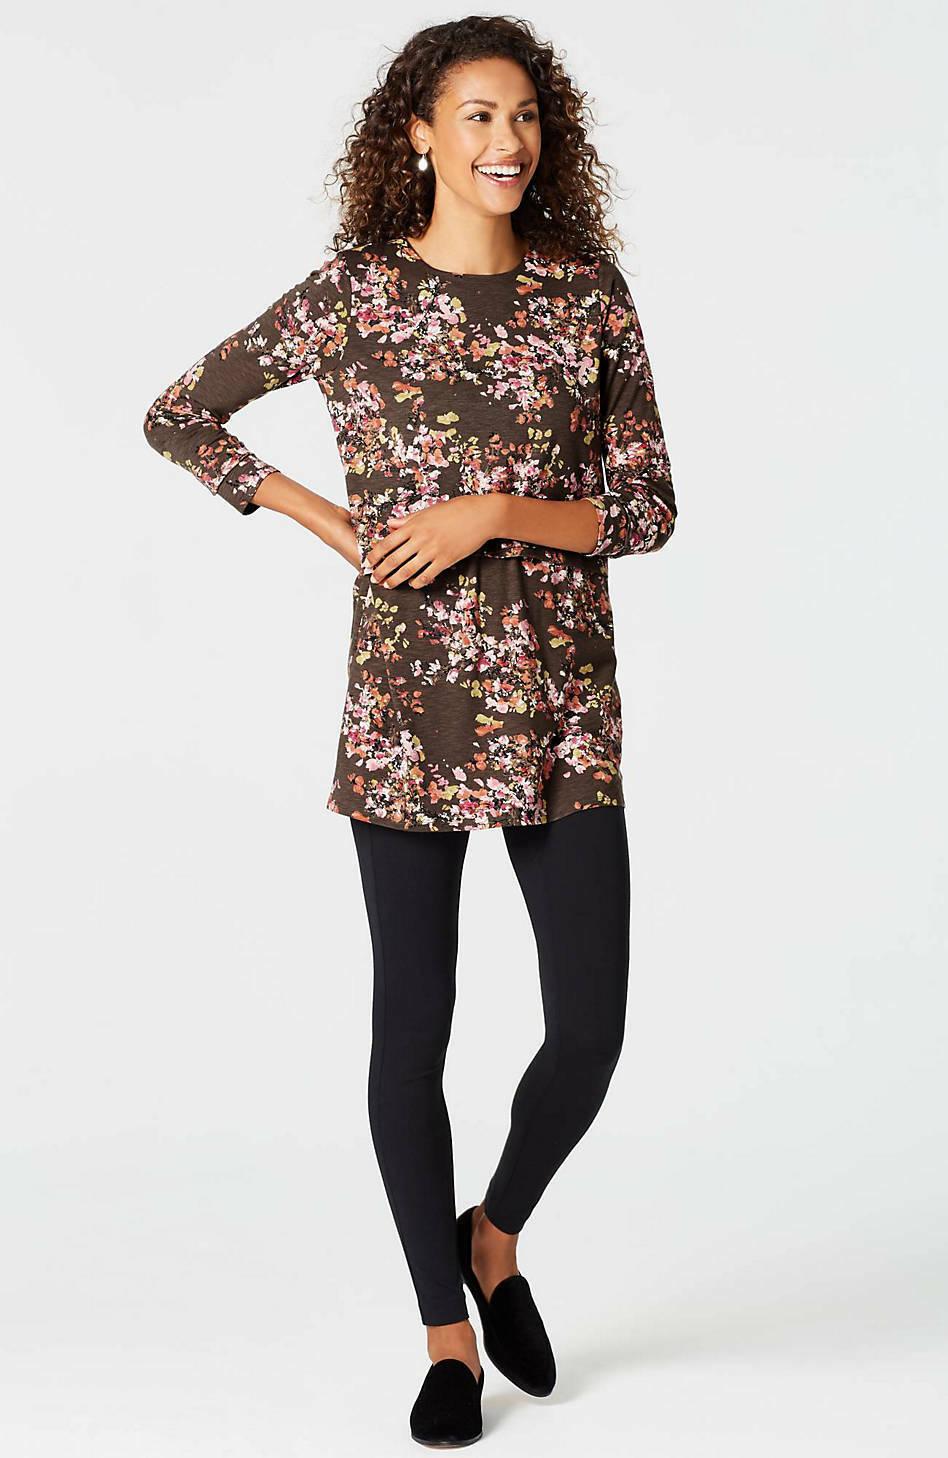 J. Jill - 4X(Plus) - Very Beautiful Mocha Abstract Blossoms Knit Tunic - NWT